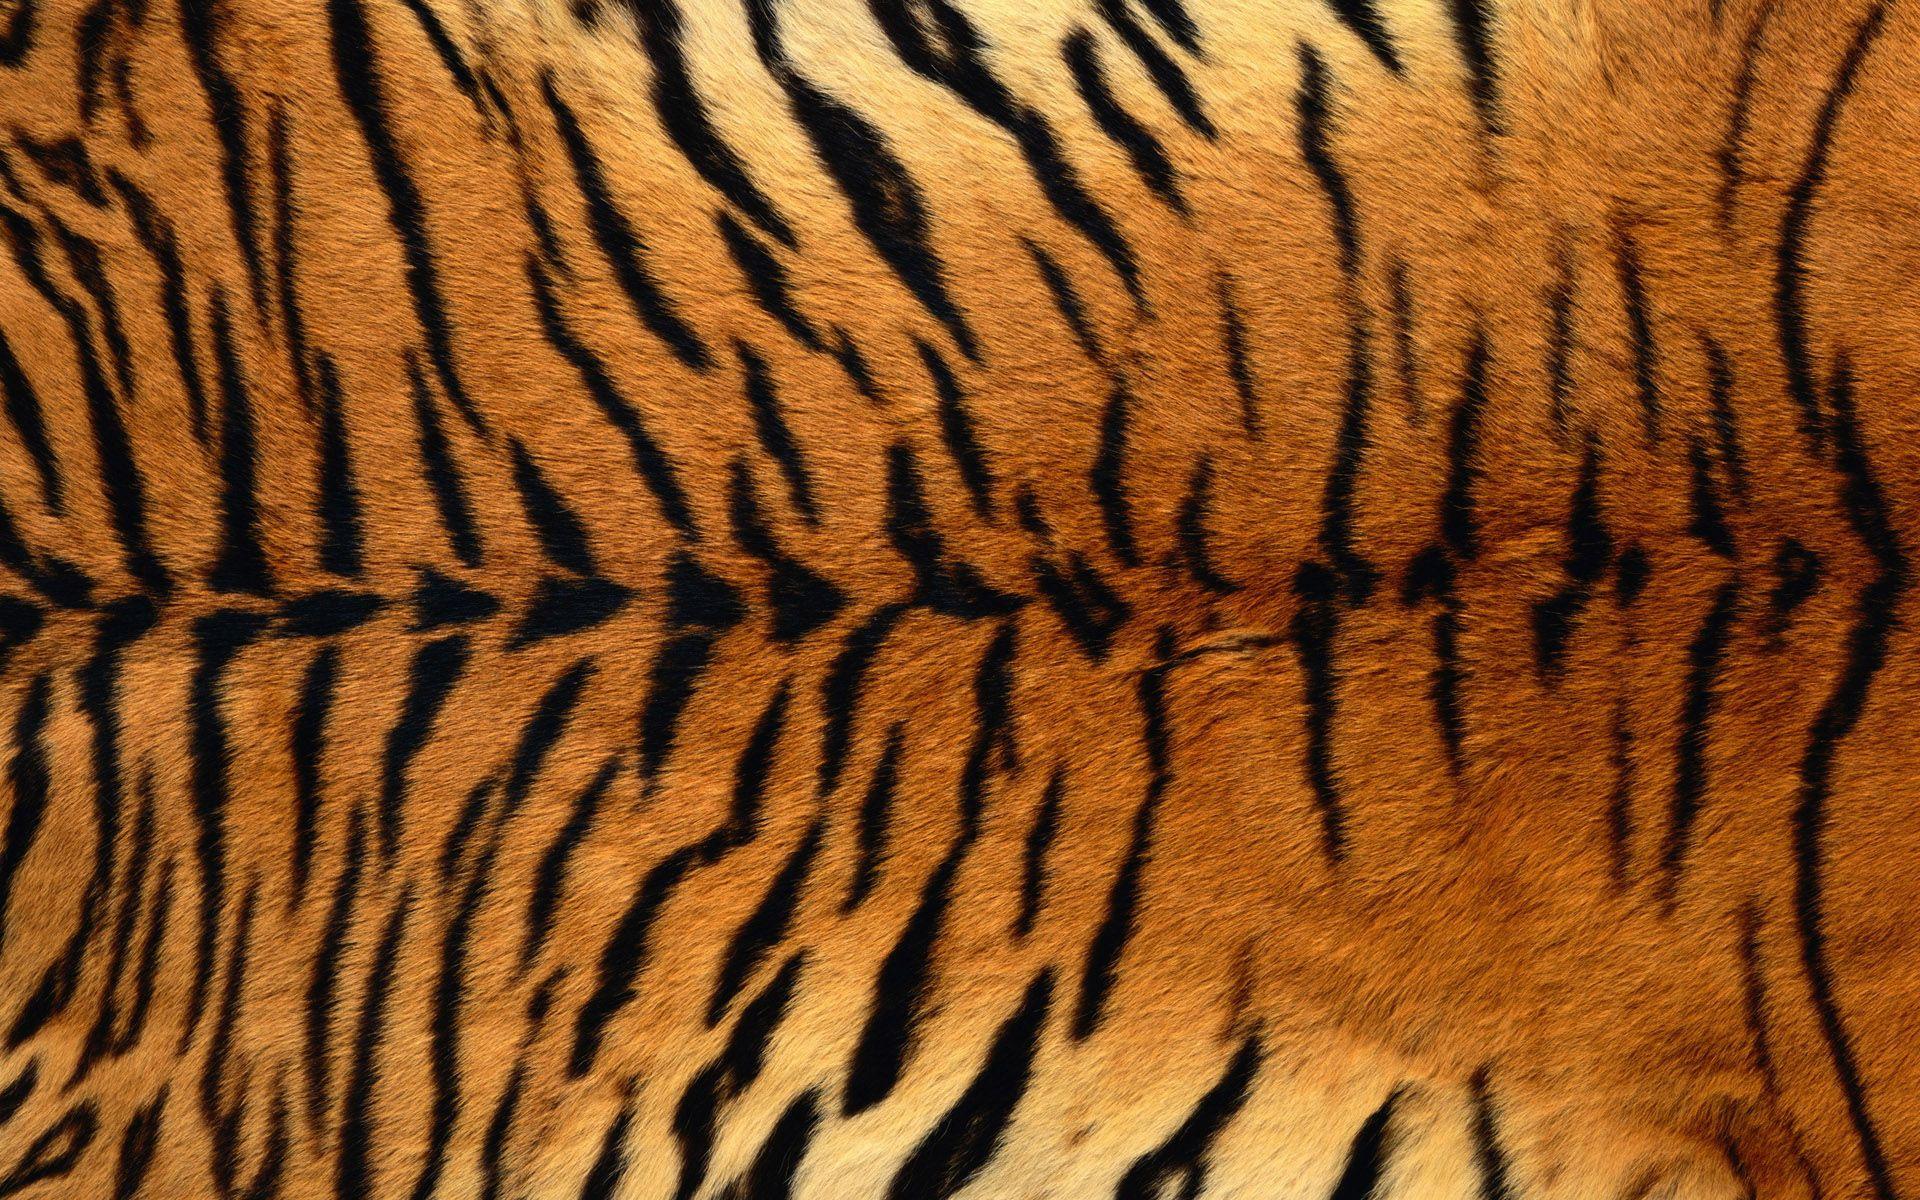 Tiger skin print photo